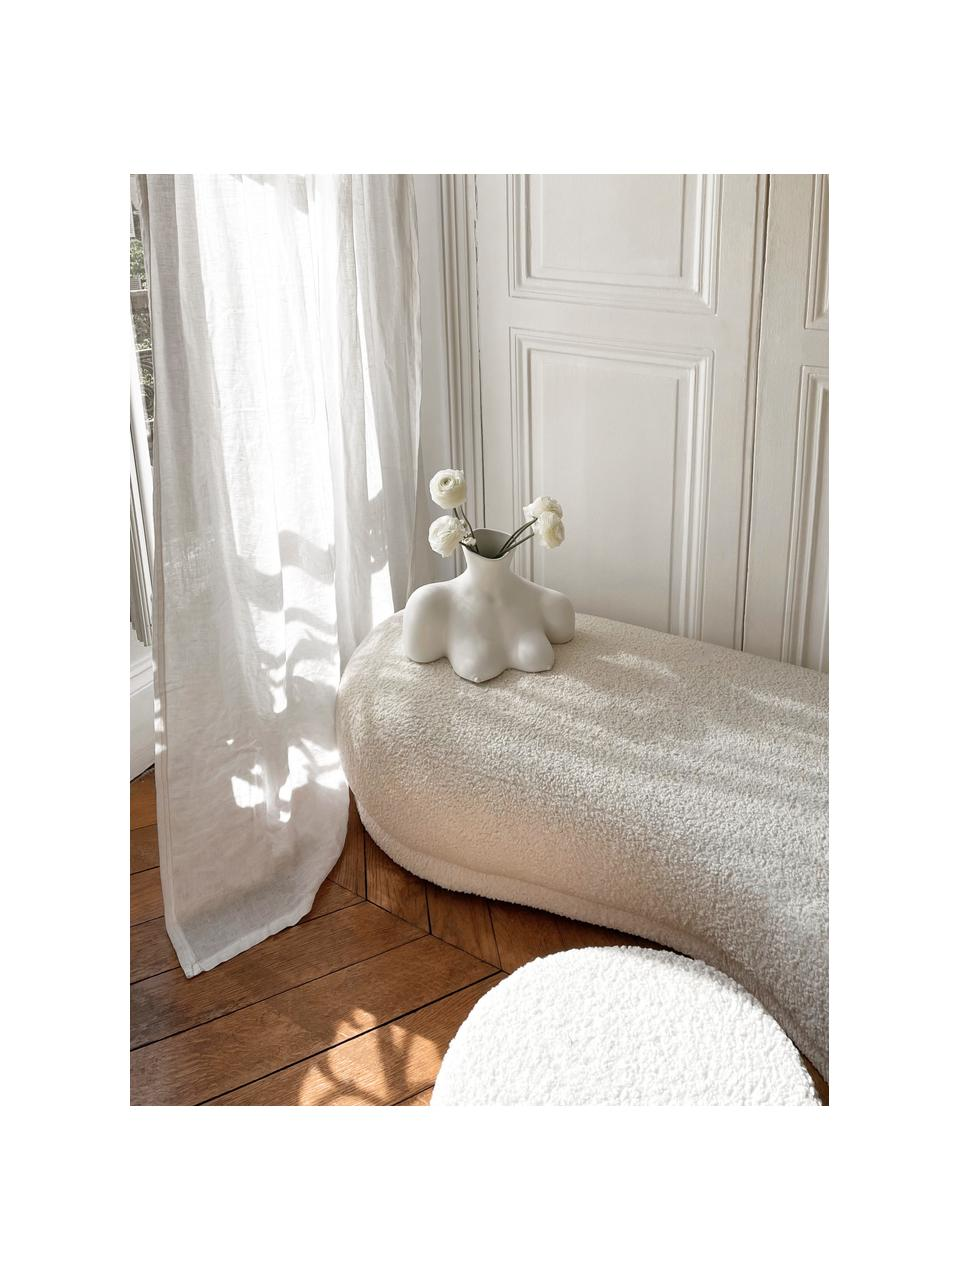 Teddy zitbank Coconino in crèmewit, gestoffeerd, Bekleding: polyester (teddy), Frame: grenenhout, Teddy crèmewit, 160 x 36 cm